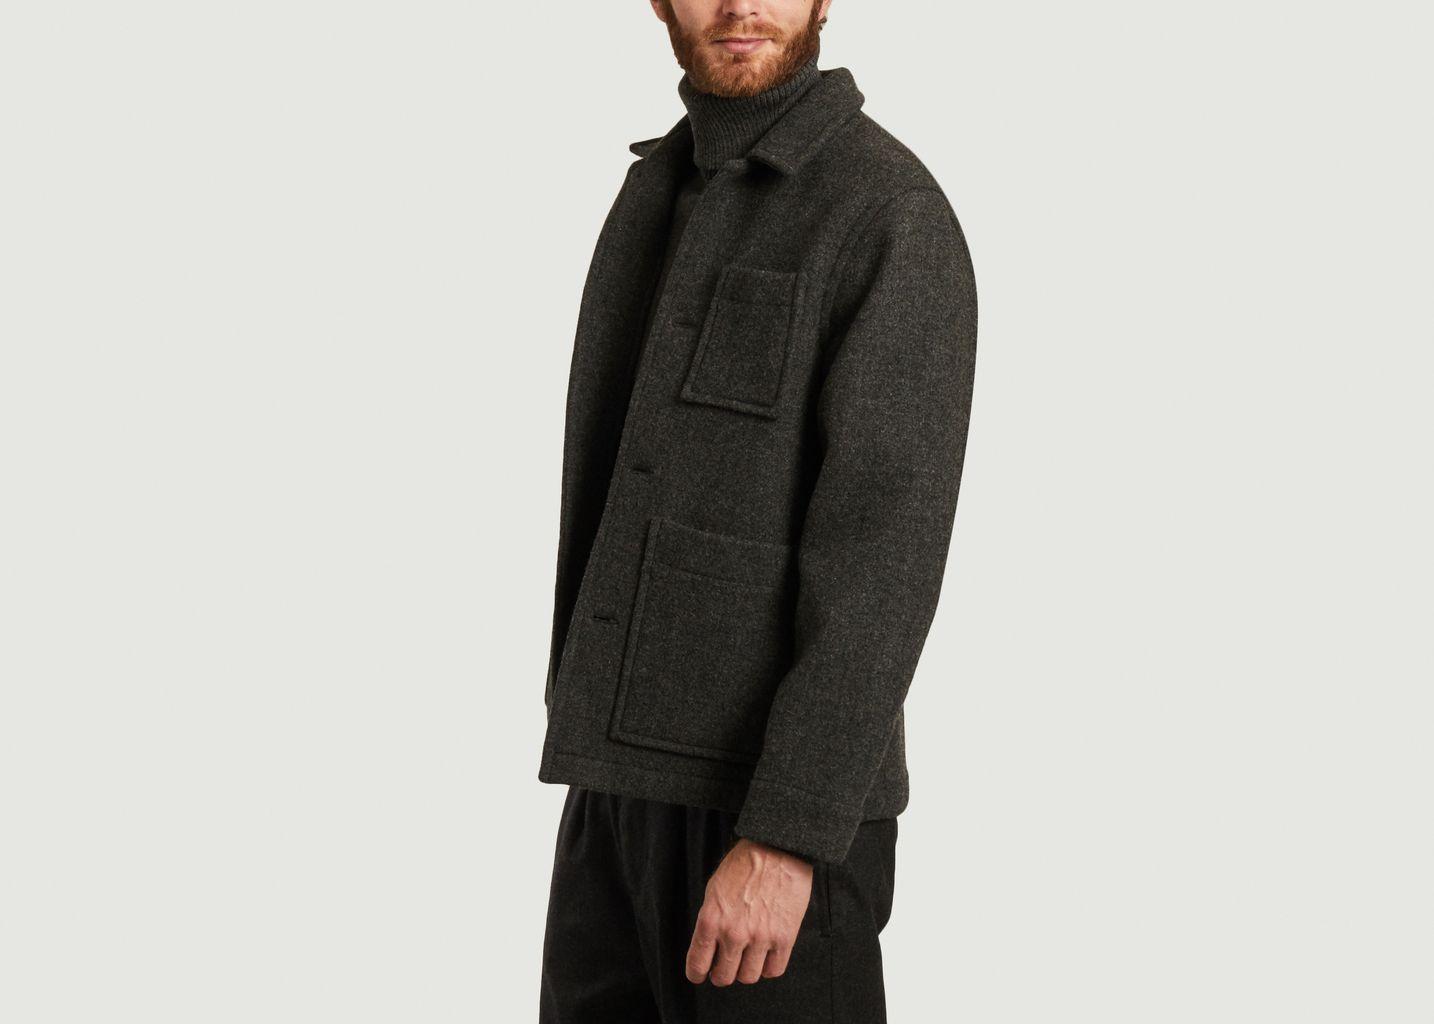 Veste en laine mérinos Dubliner - Outland